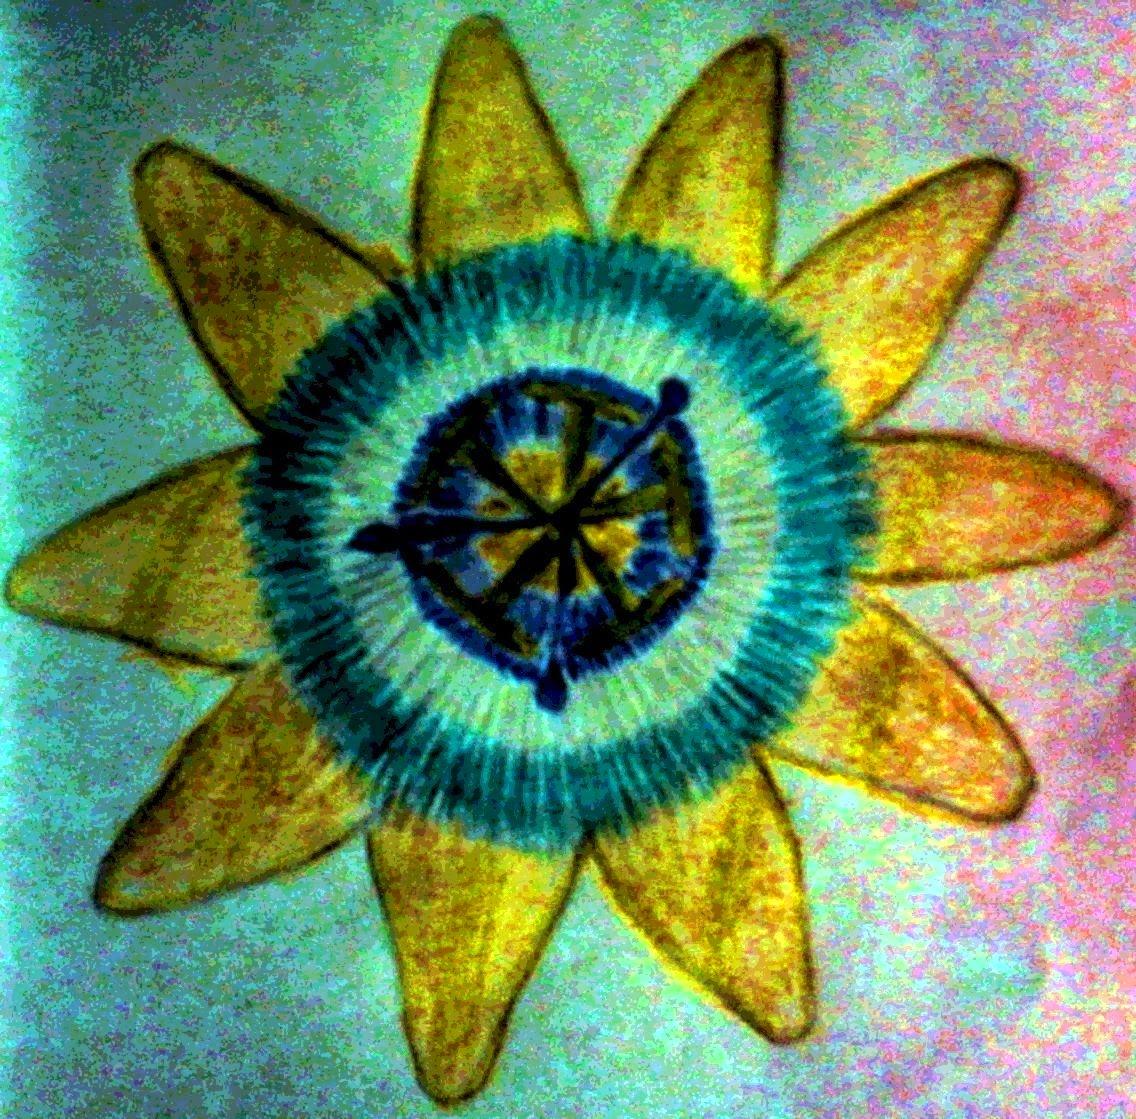 http://naturalezayculturaargentina.blogspot.com.ar/2011/11/mburucuya.html